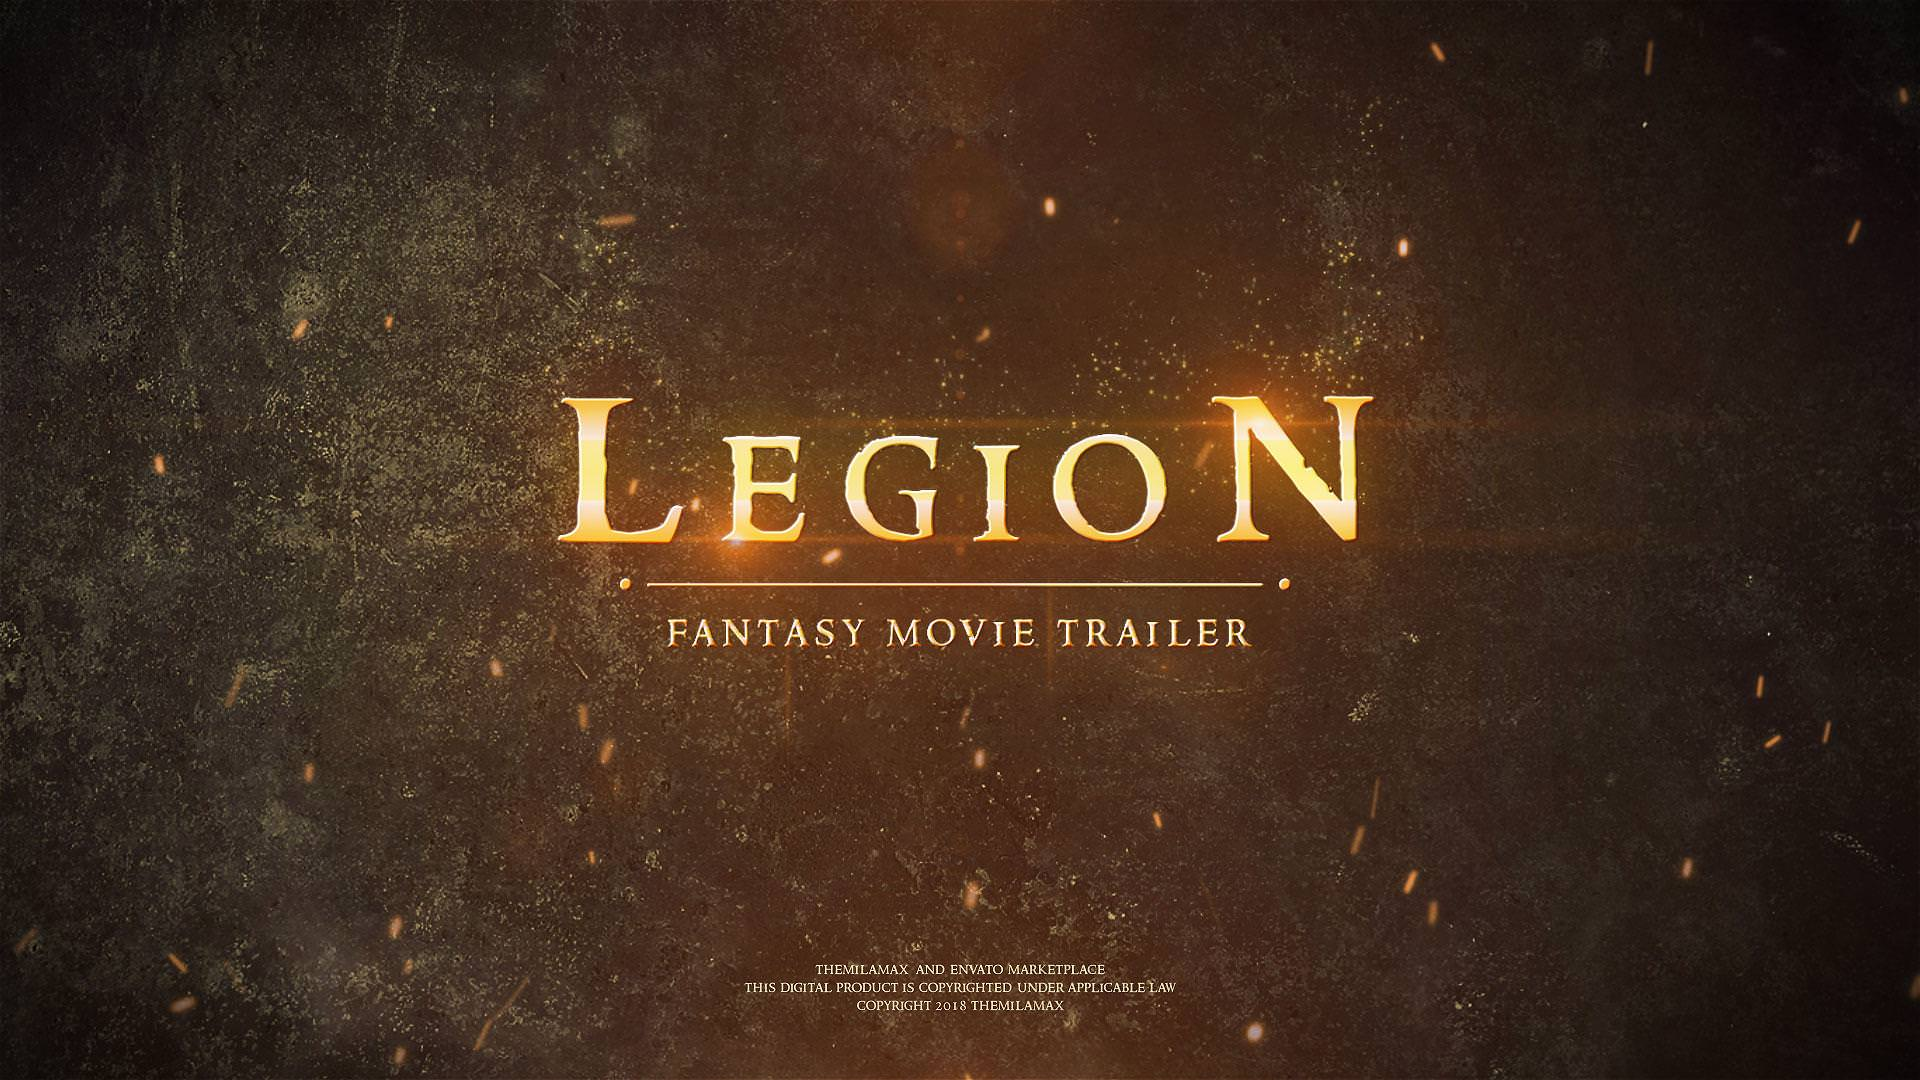 Legion - Fantasy Movie Trailer - 12